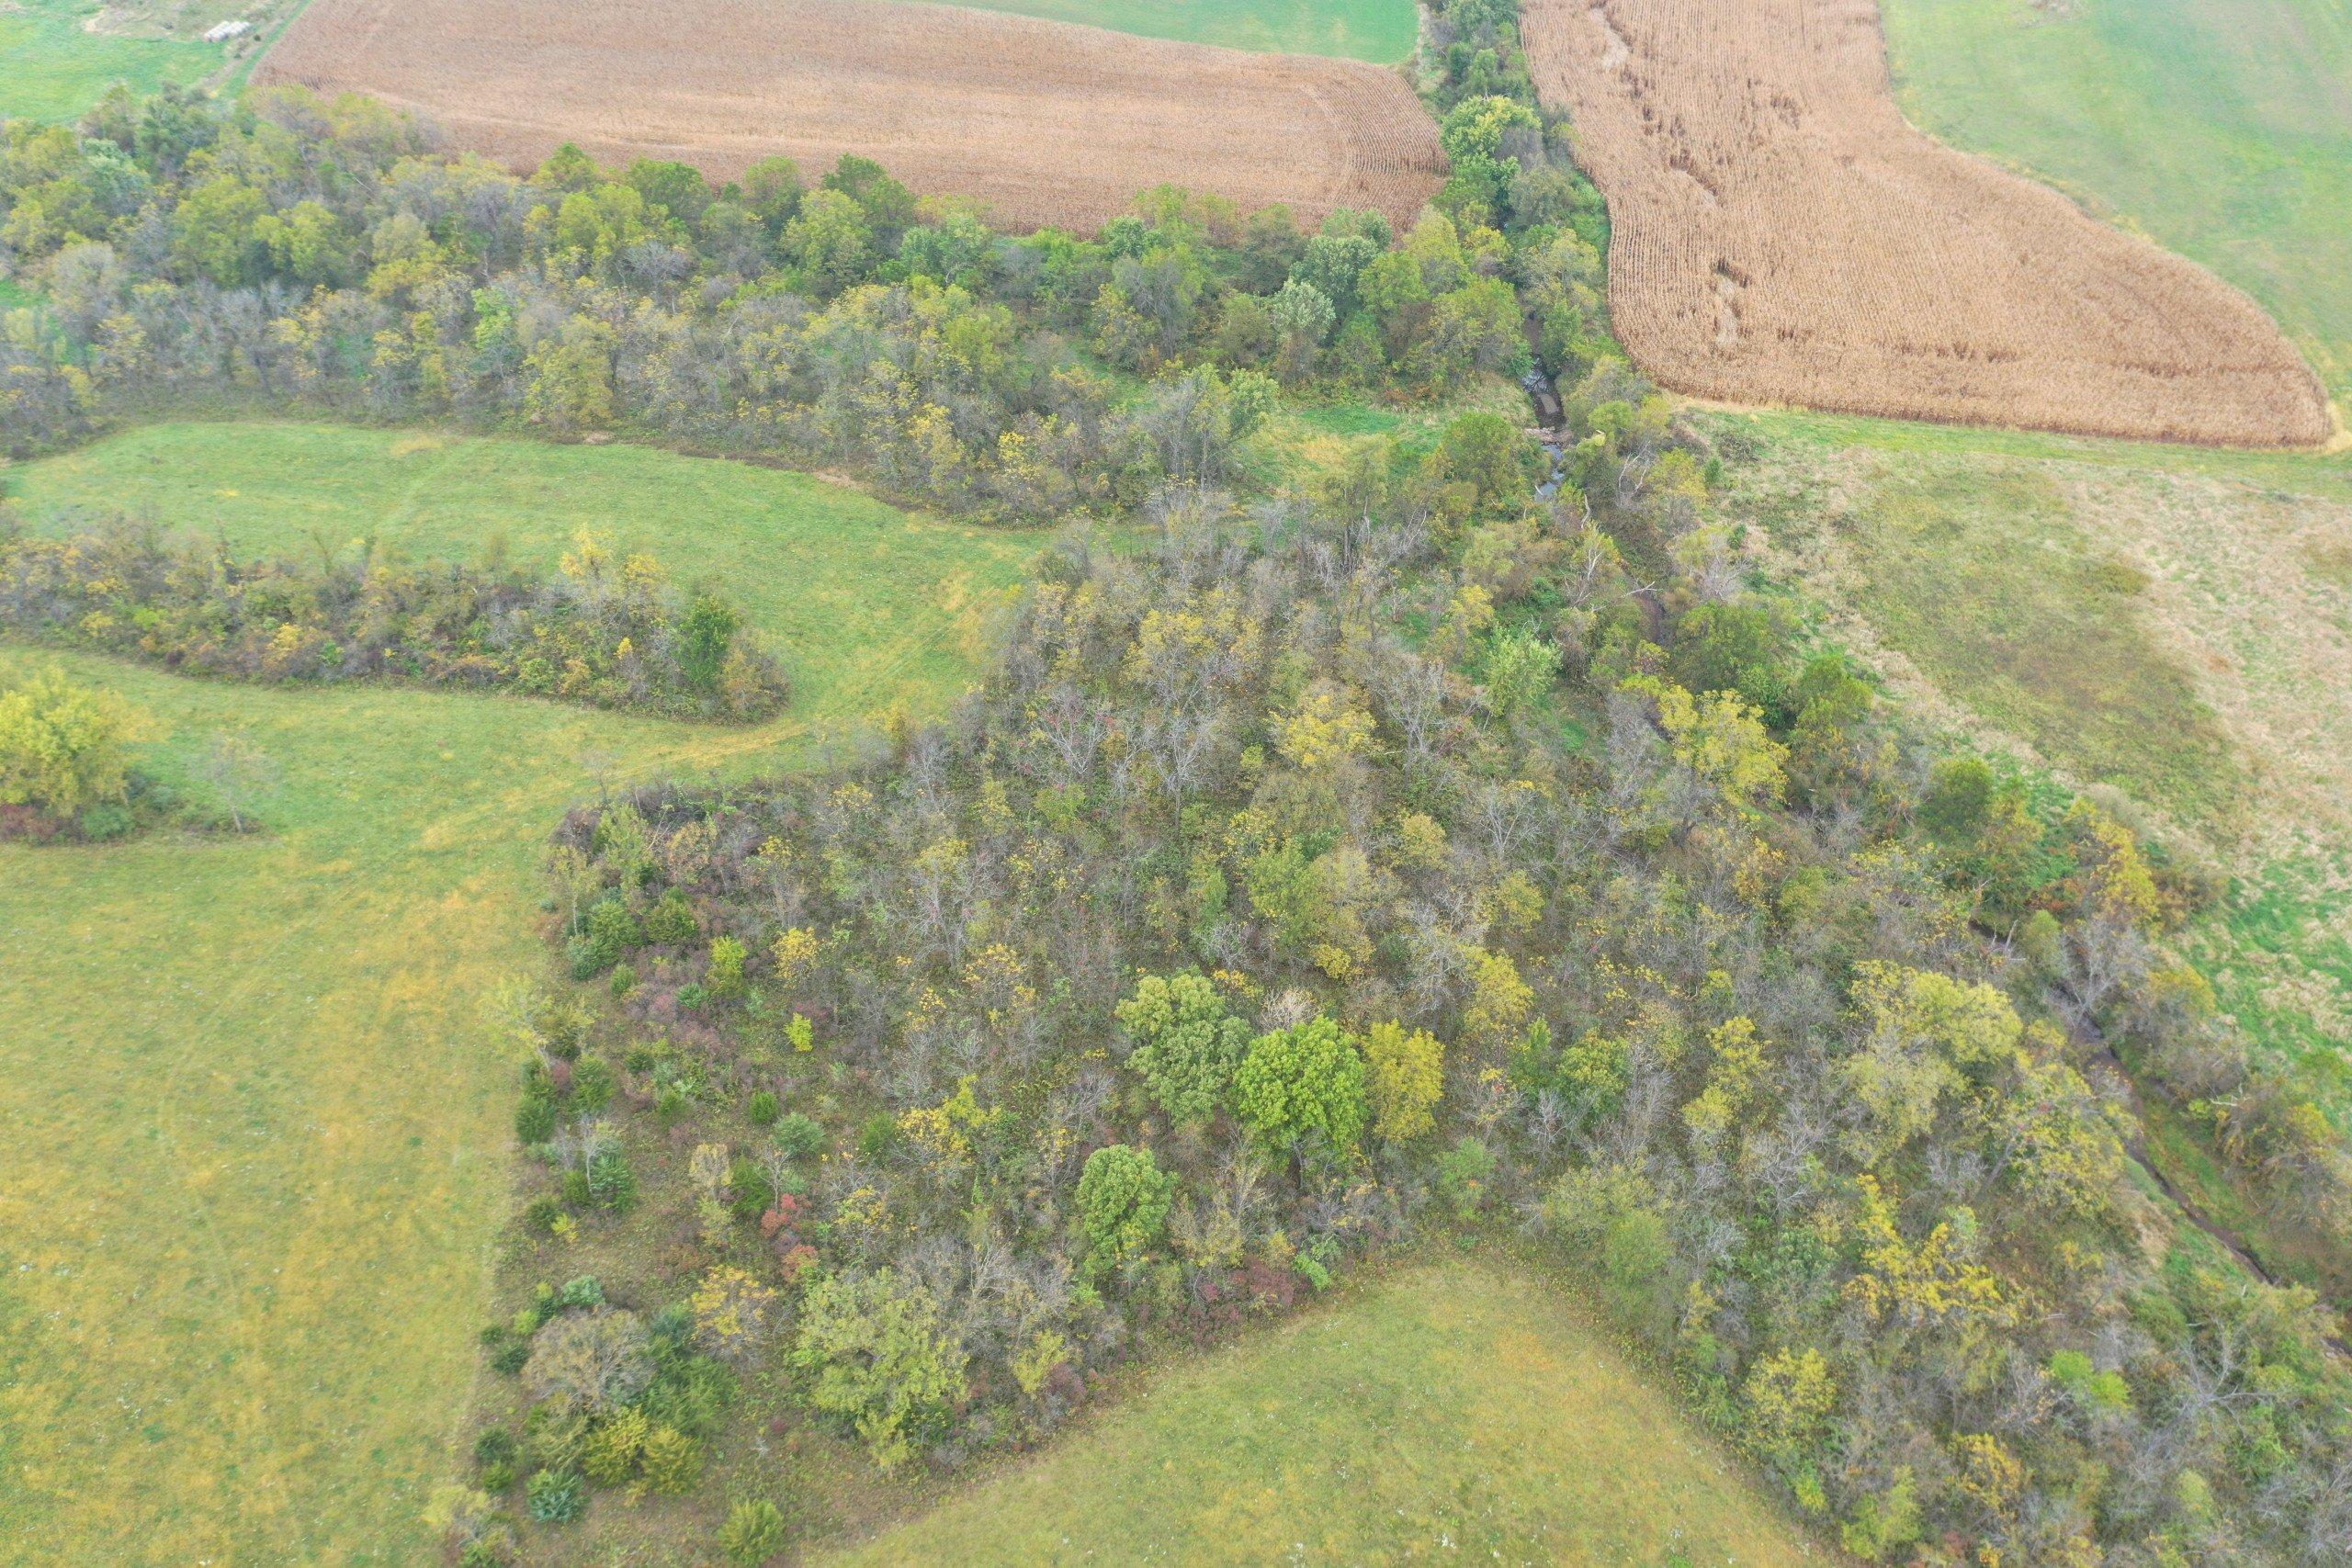 land-warren-county-iowa-200-acres-listing-number-15810-DJI_0590-1.jpg